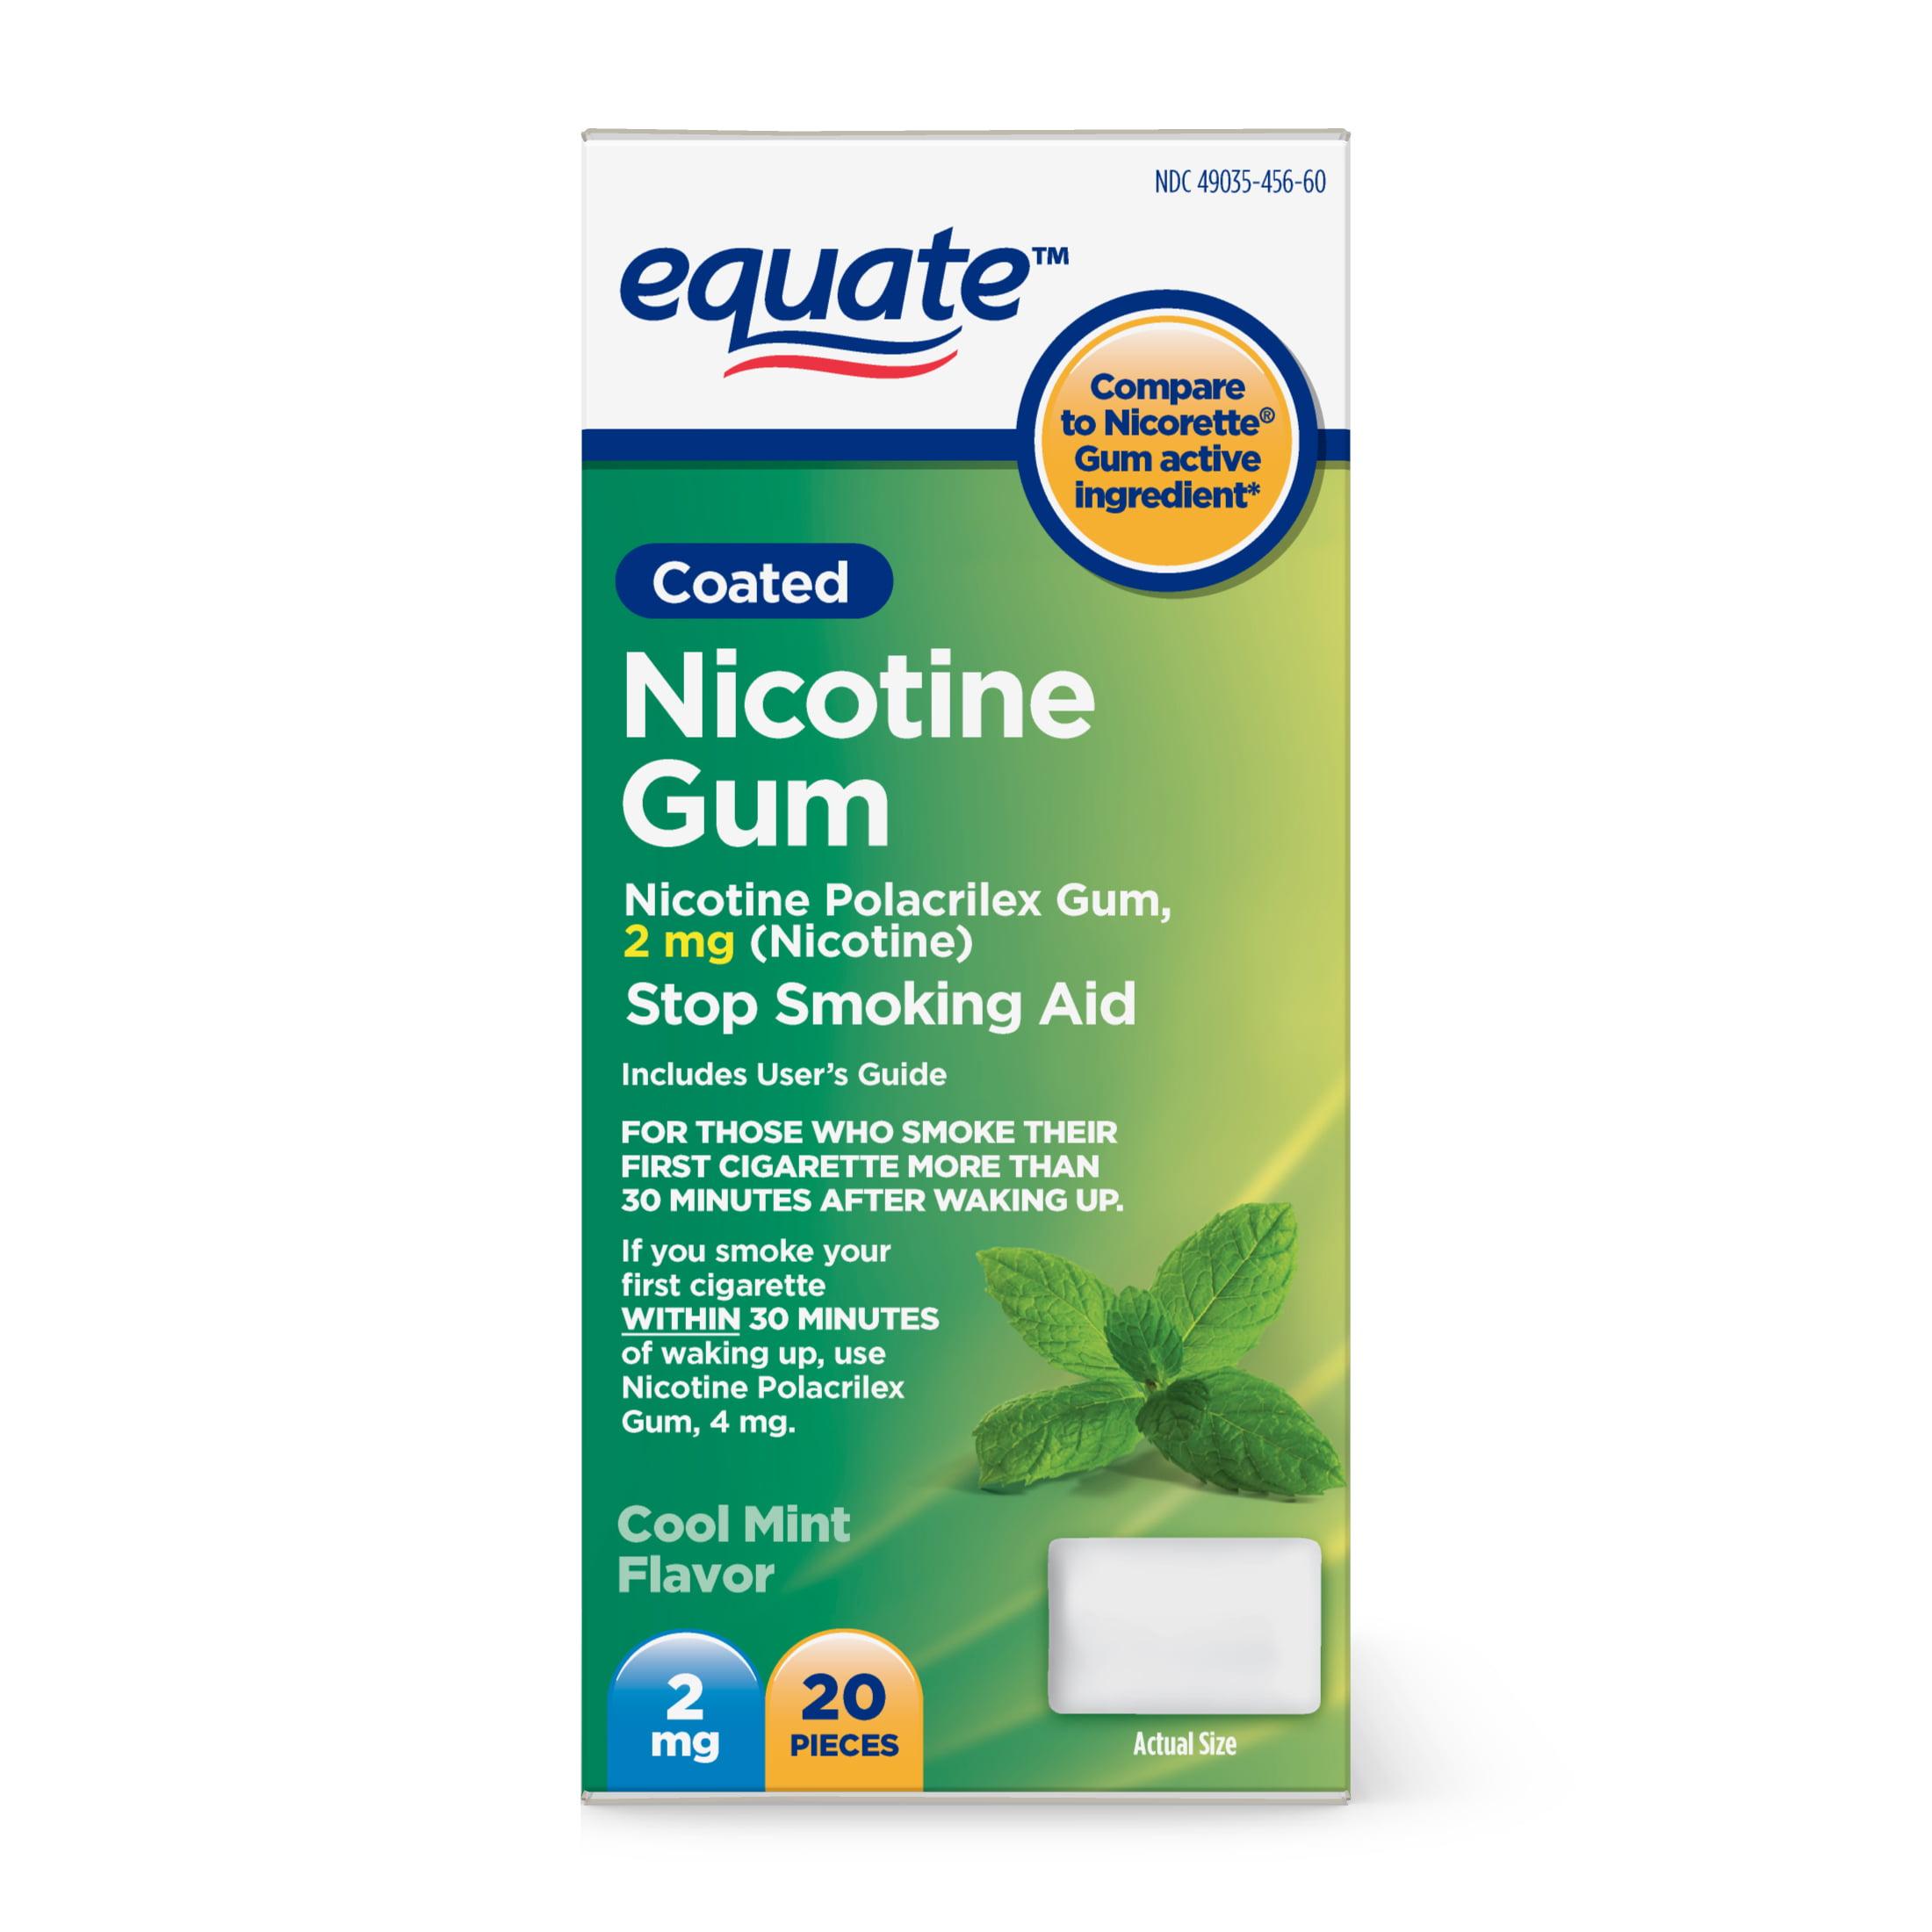 Equate Coated Nicotine Cool Mint Gum, 2 mg, 20 Ct